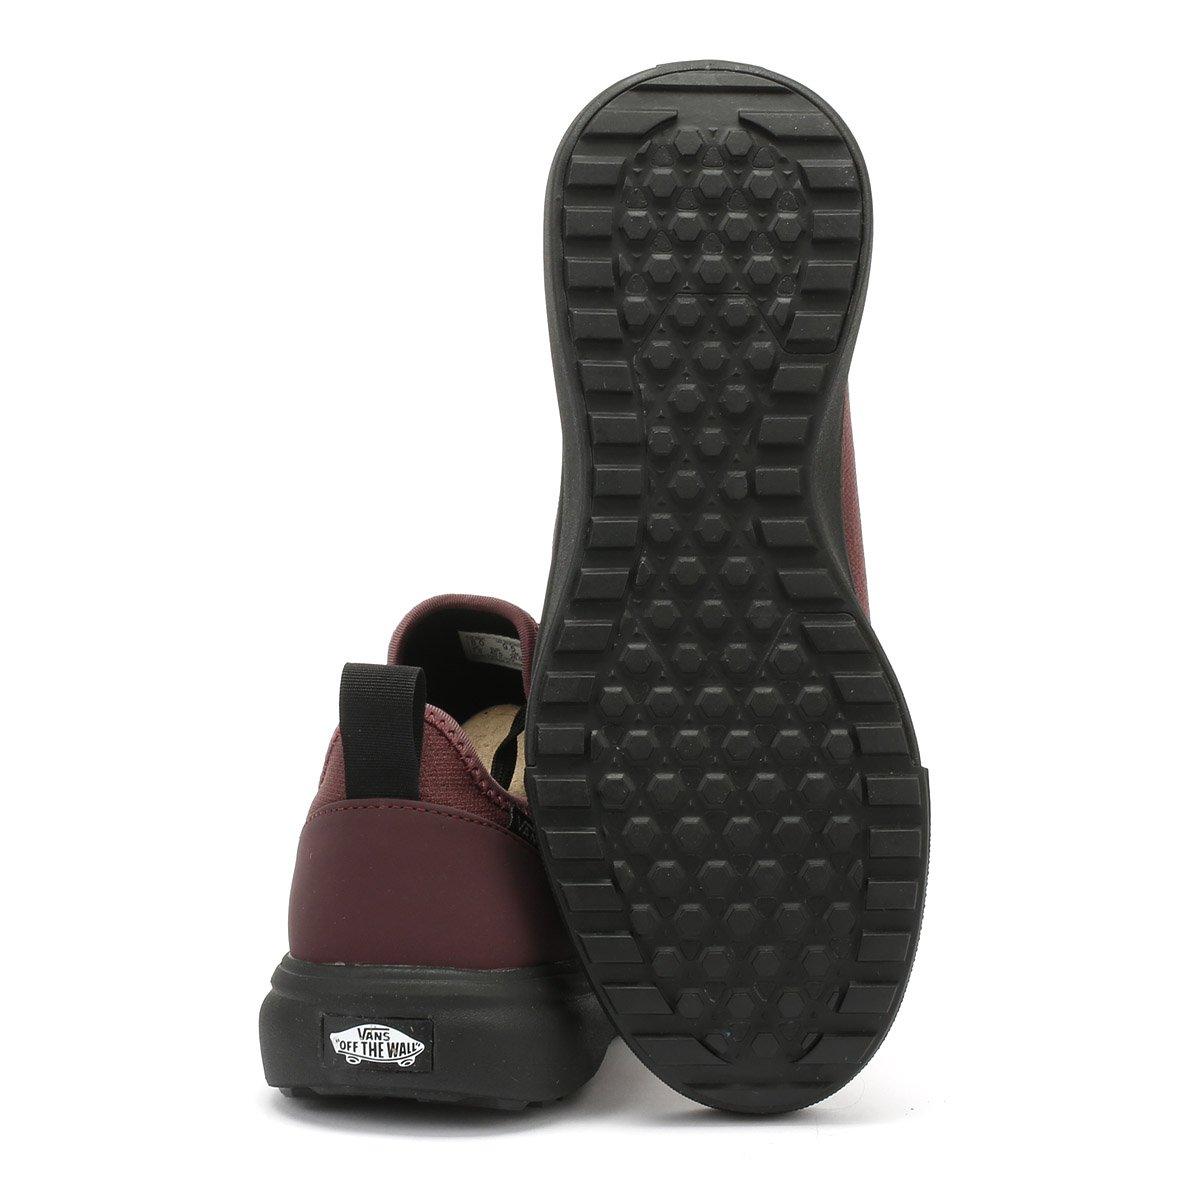 192425bcd86b4a Amazon.com  Vans Catawba Grape Burgundy Black Ultrarange AC Sneakers-UK 11   Shoes